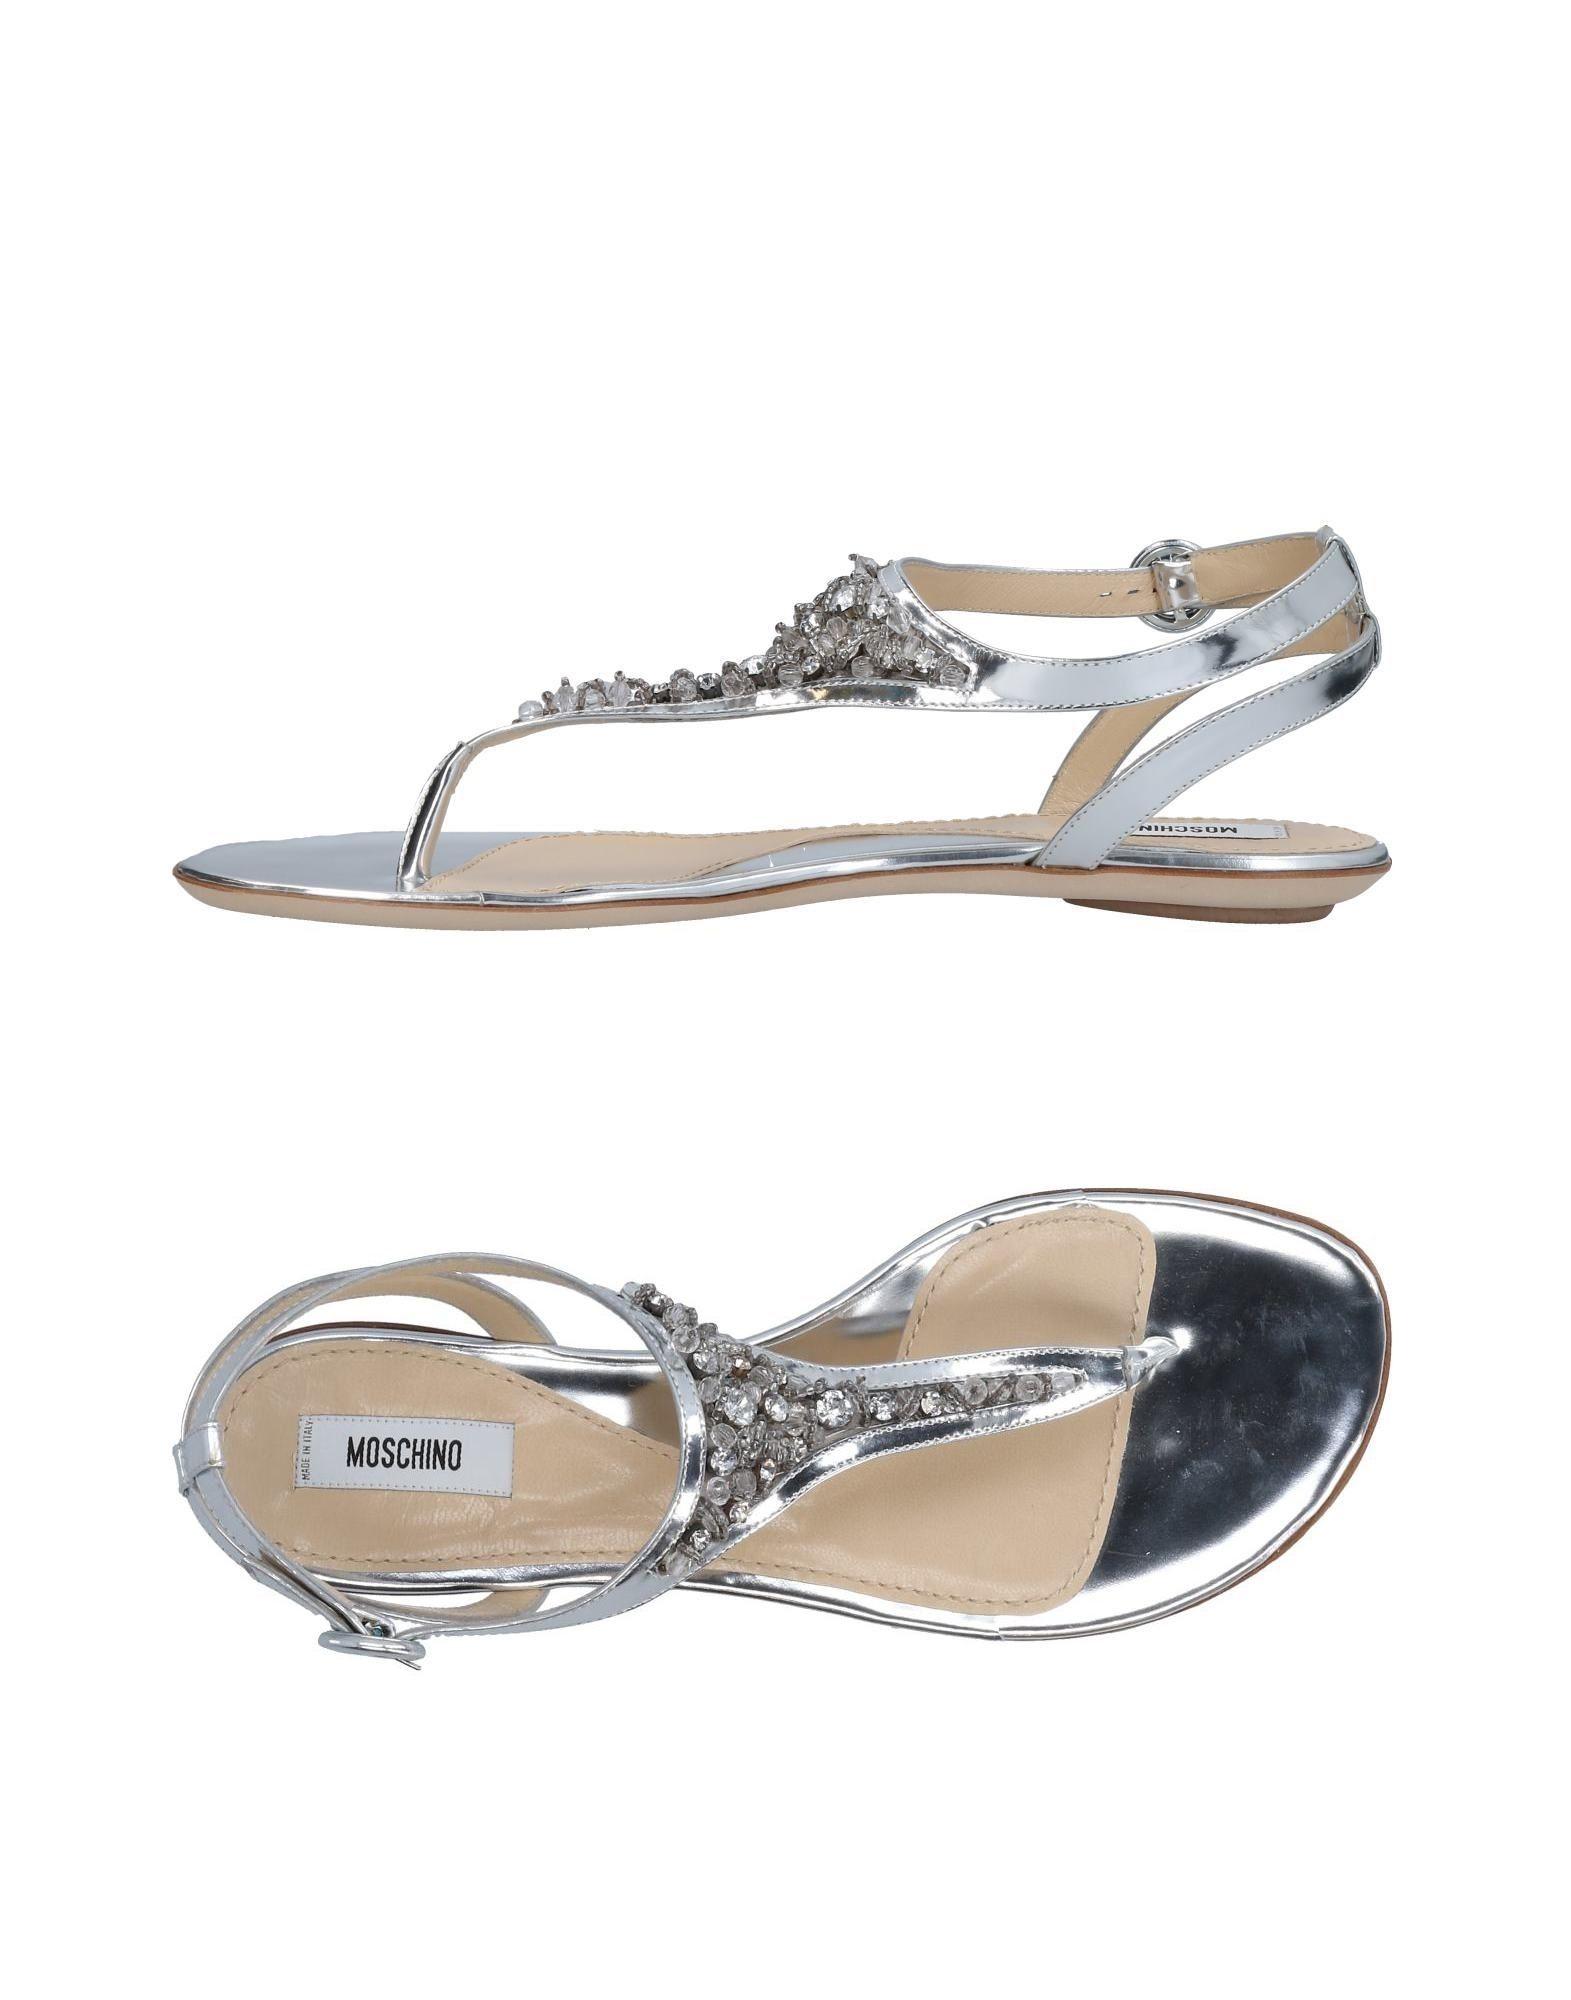 Rabatt  Schuhe Moschino Dianetten Damen  Rabatt 11462355AQ 4f34c5